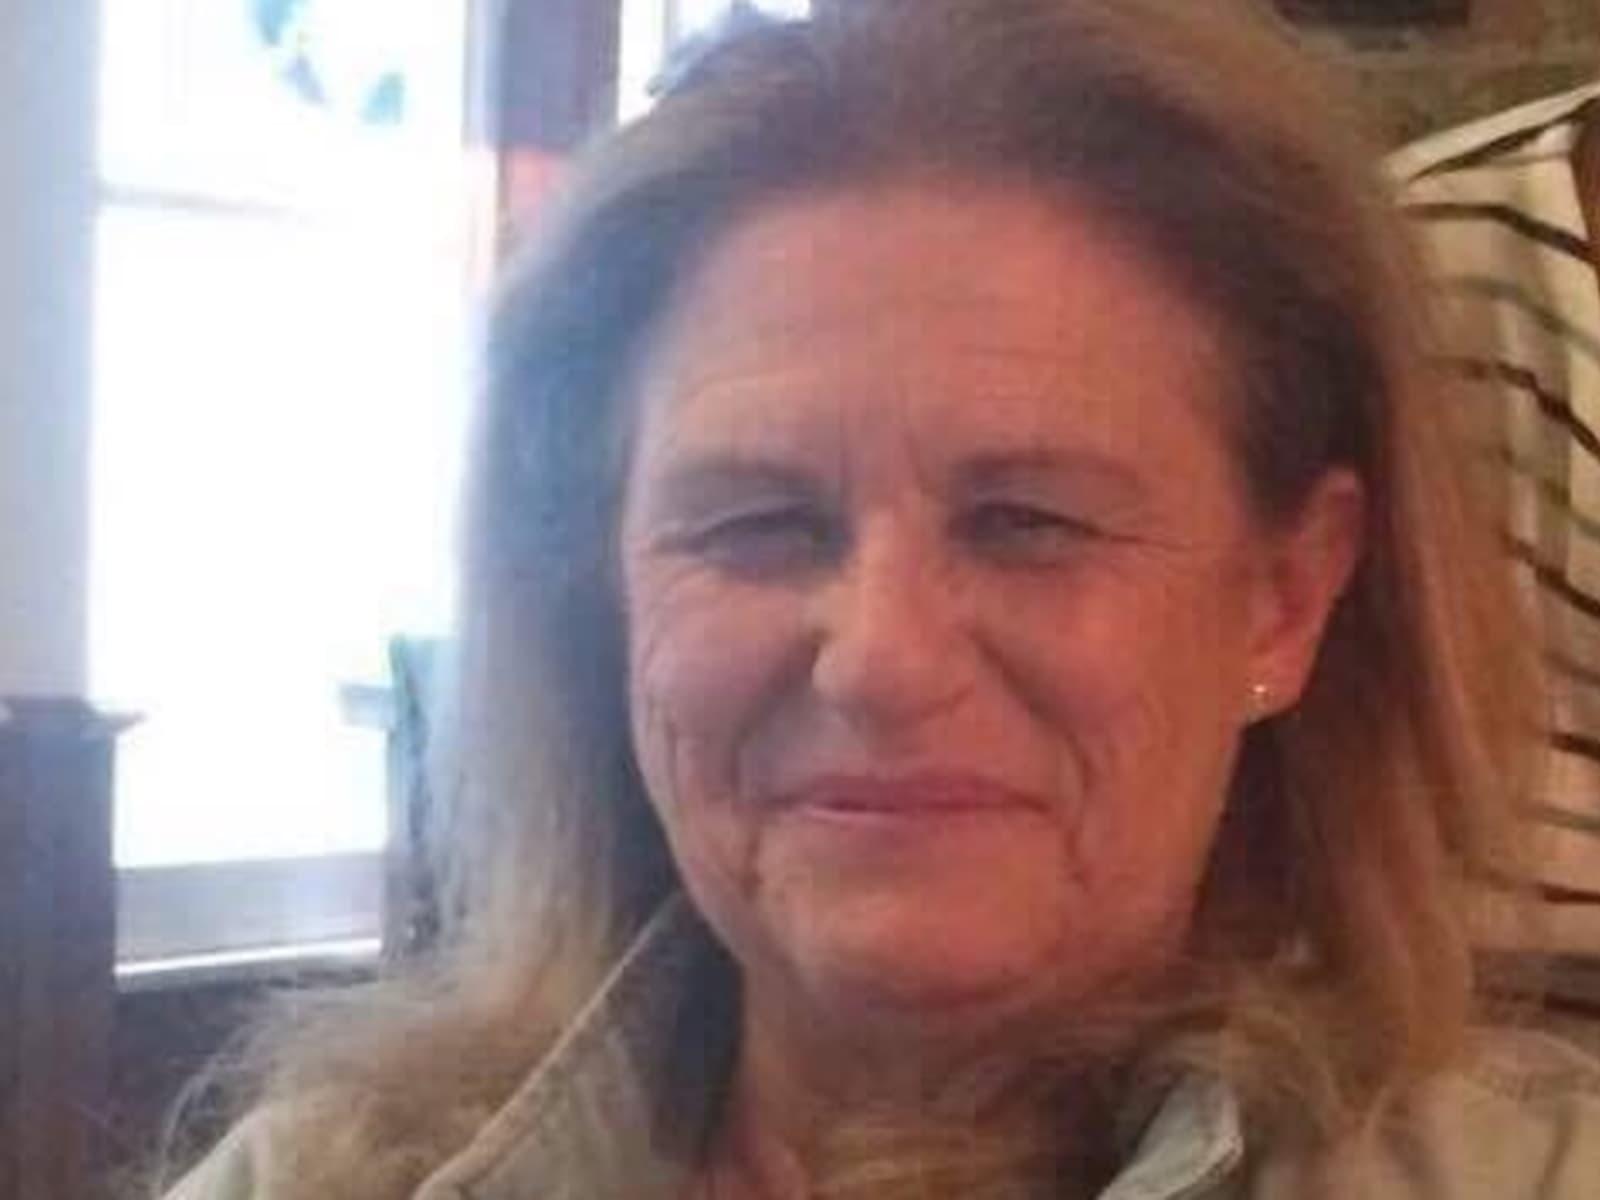 Deborah from Hillarys, Western Australia, Australia